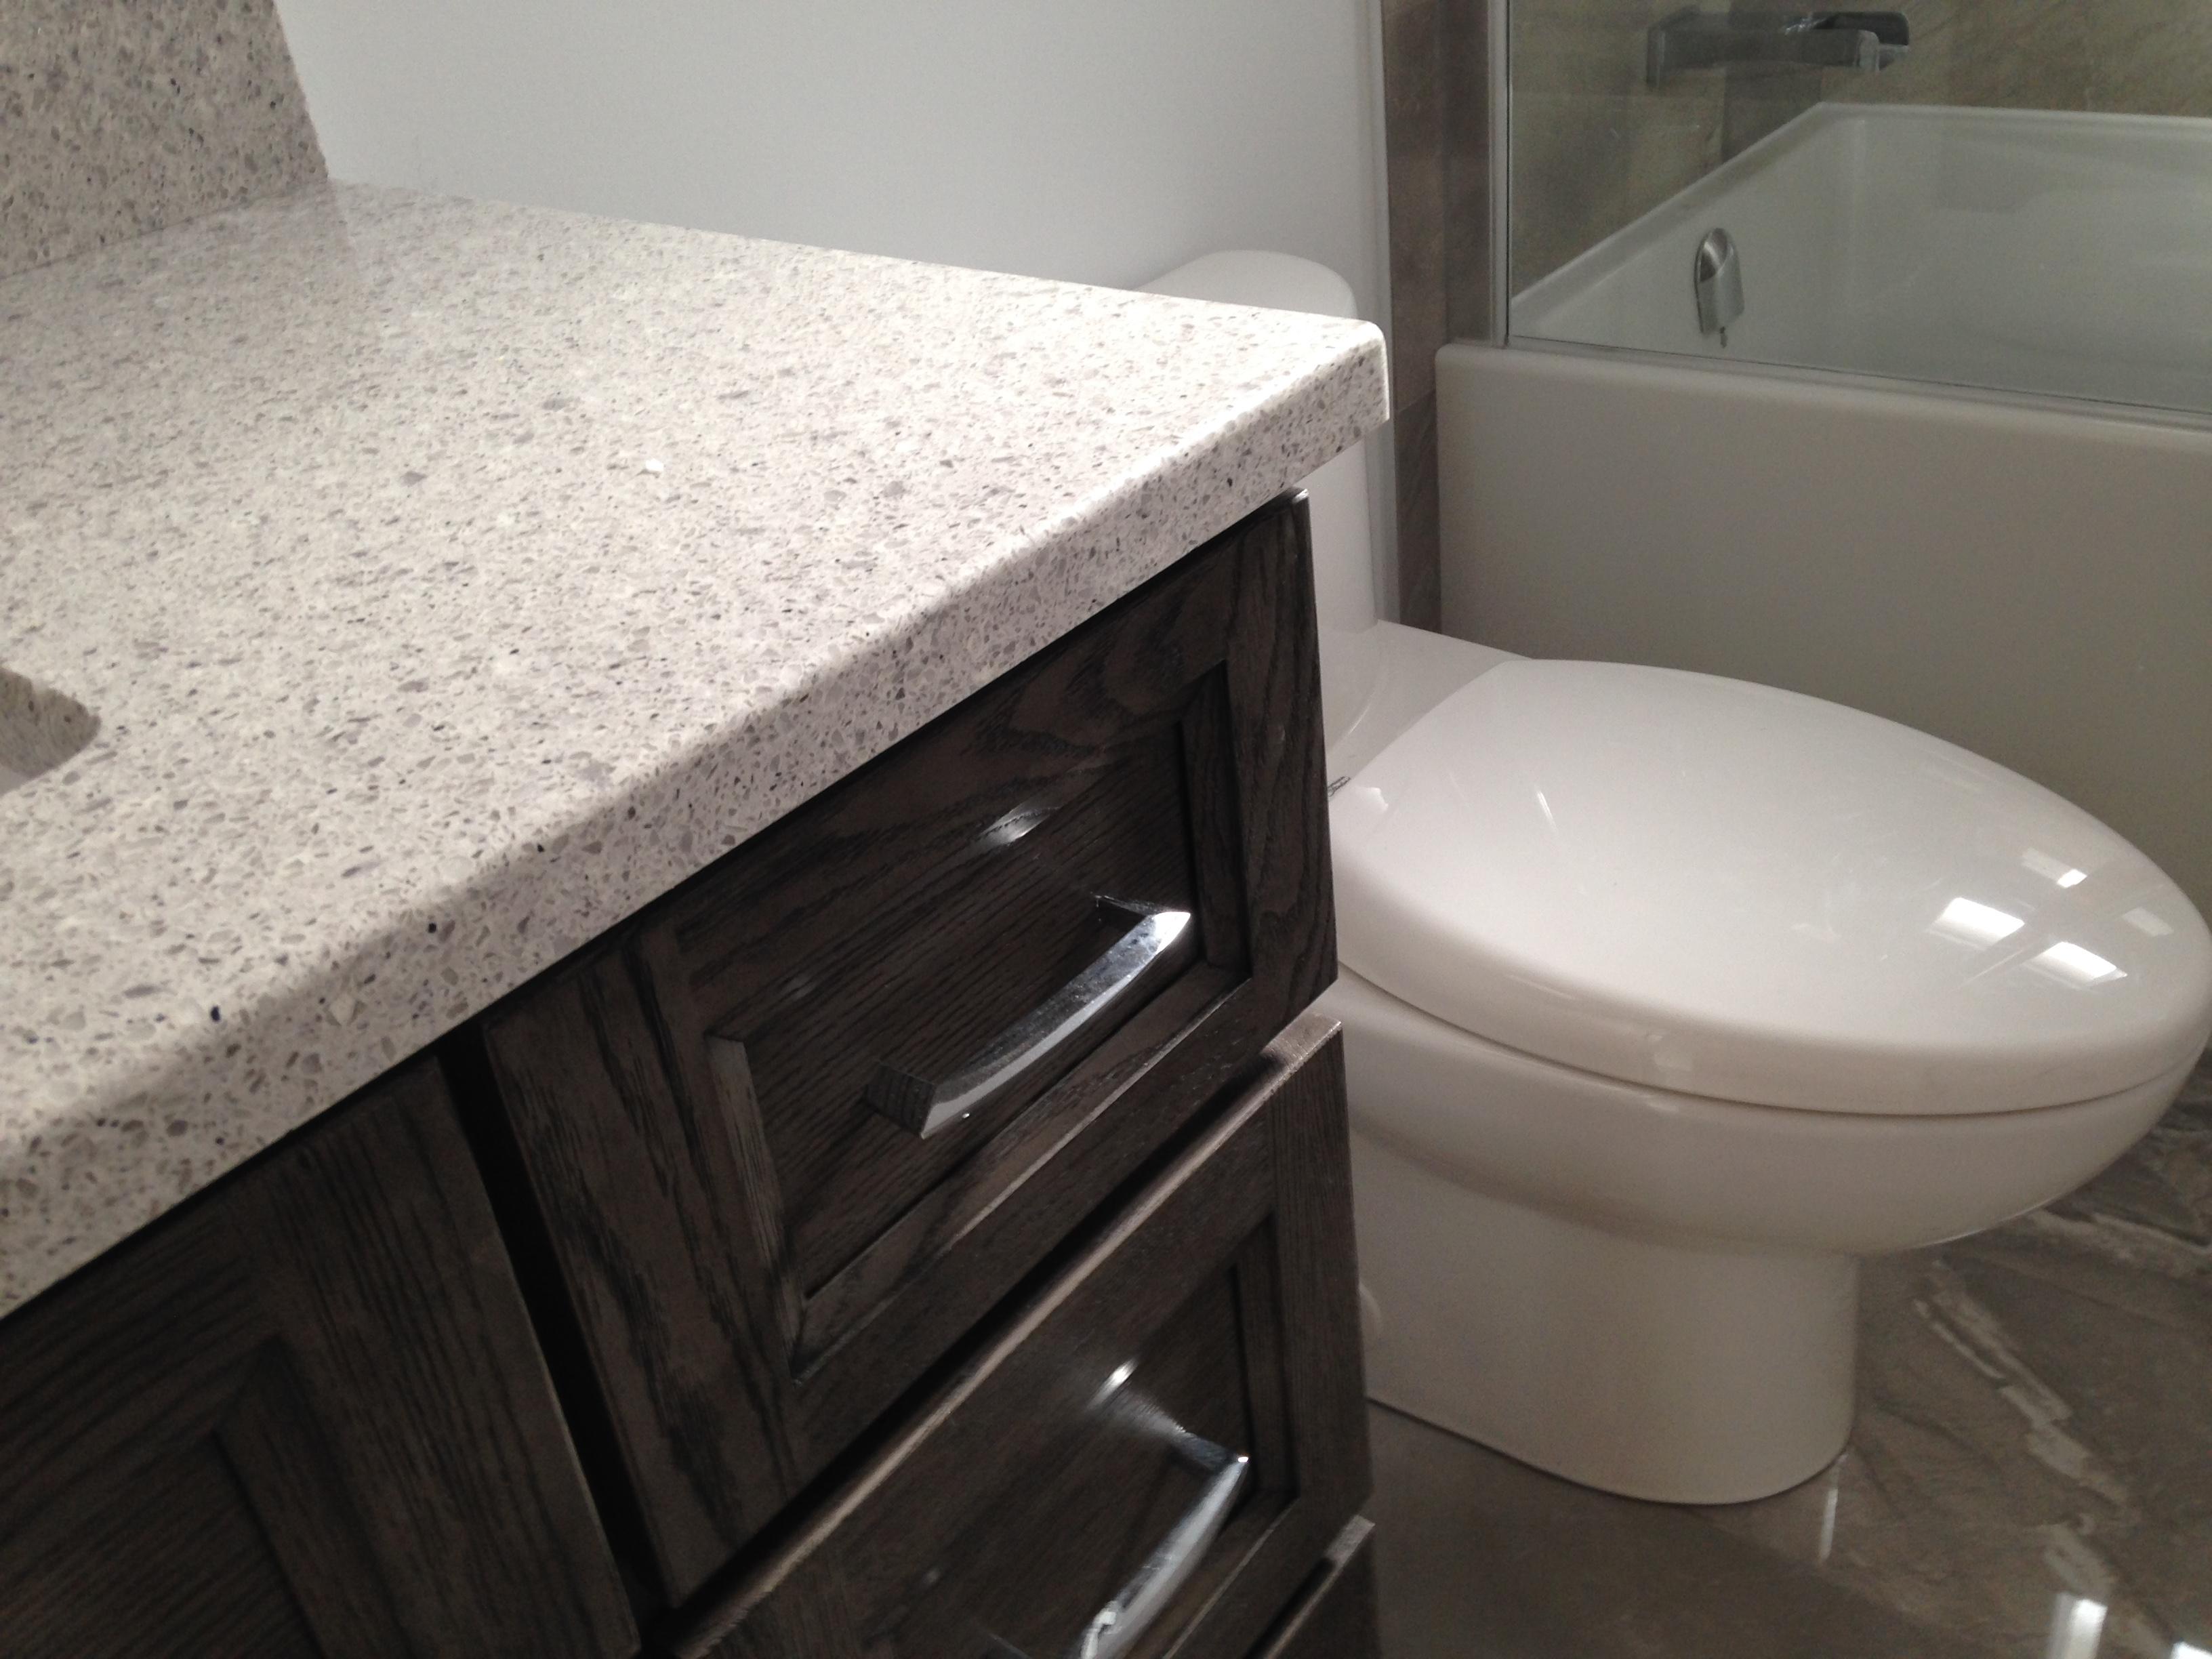 Bathroom Sinks London Ontario ontario home renovators, basements, full bathroom renovations